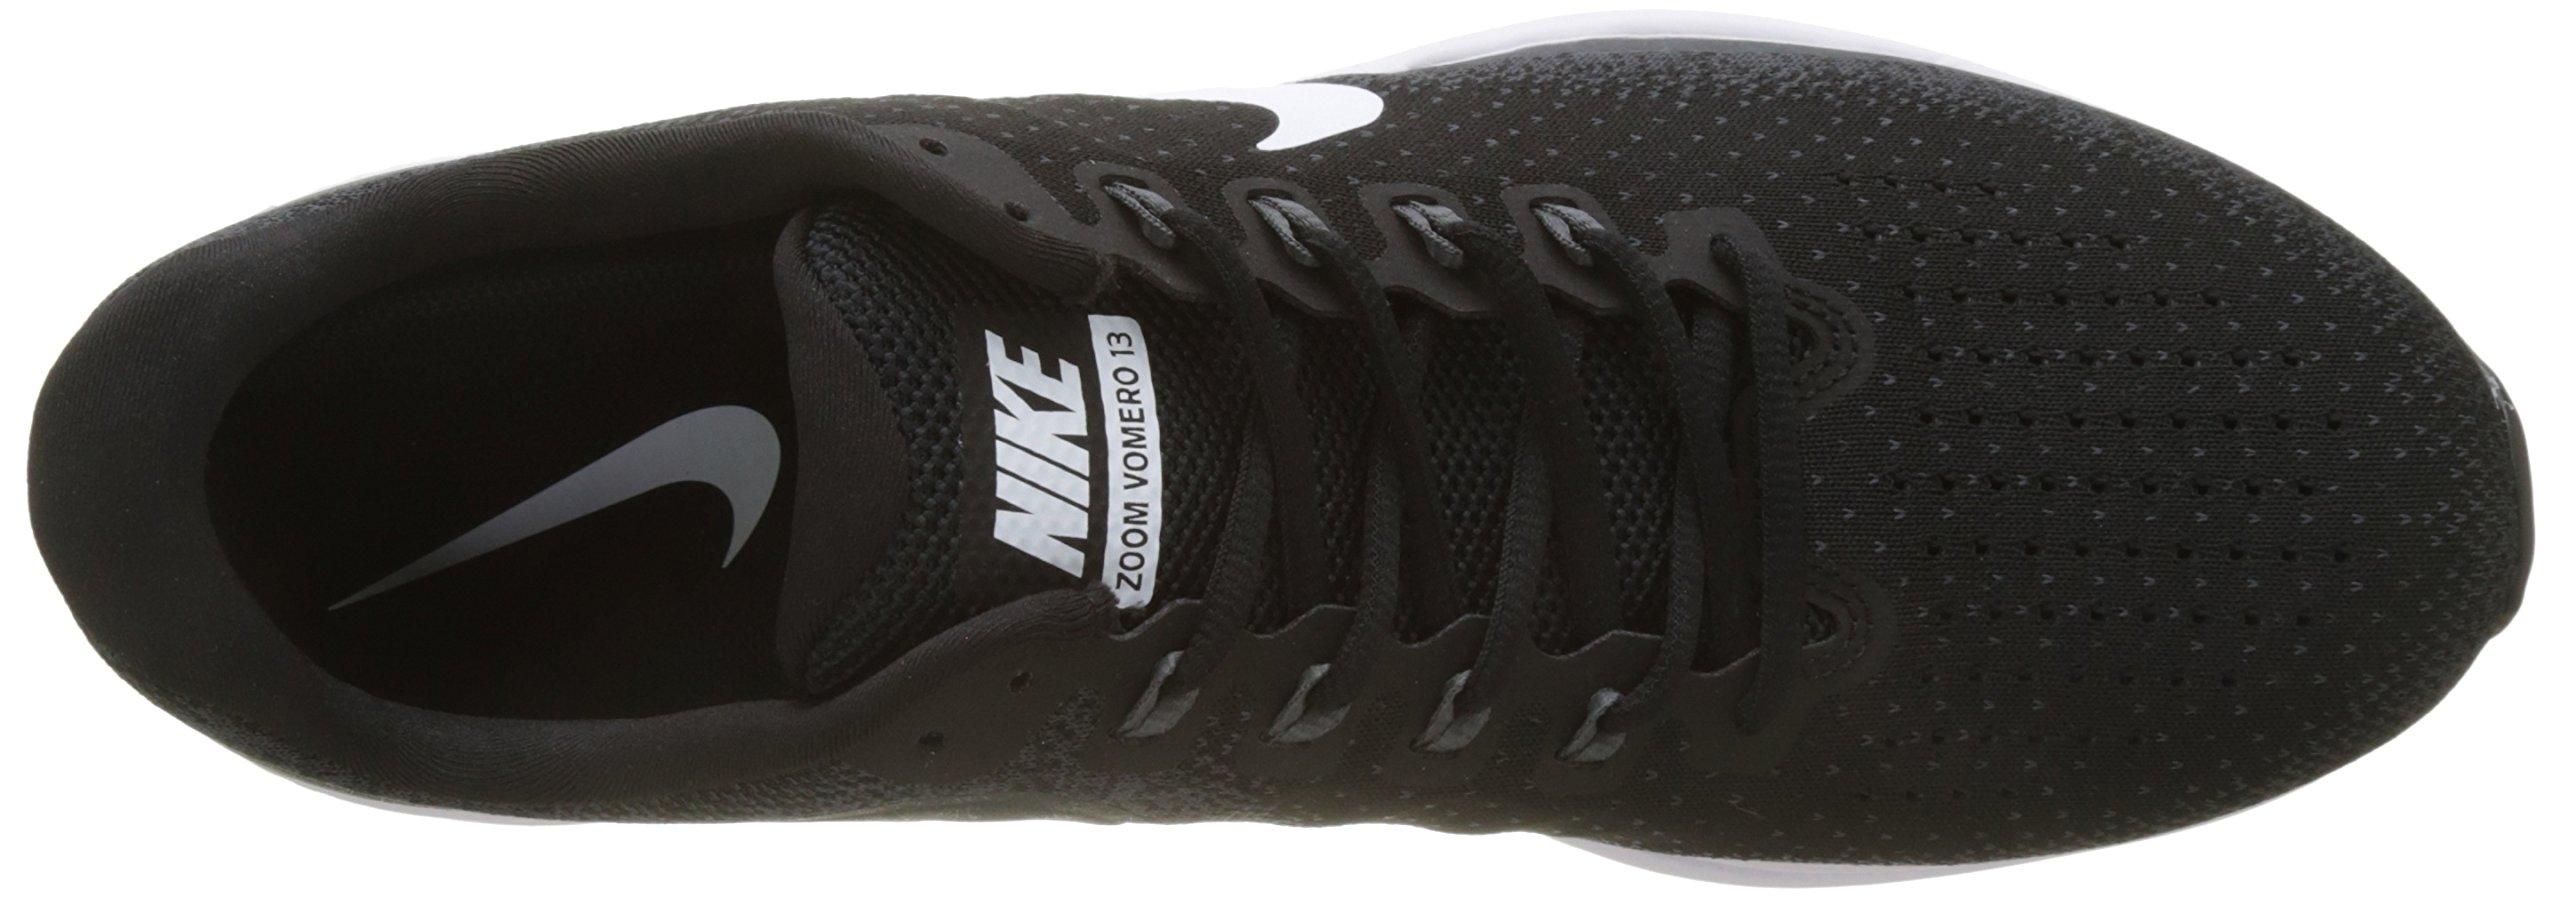 d44c17e29d9 Nike Men s Air Zoom Vomero 13 Black White Anthracite Running Shoe 9 Men US  - 922908 001   Road Running   Clothing